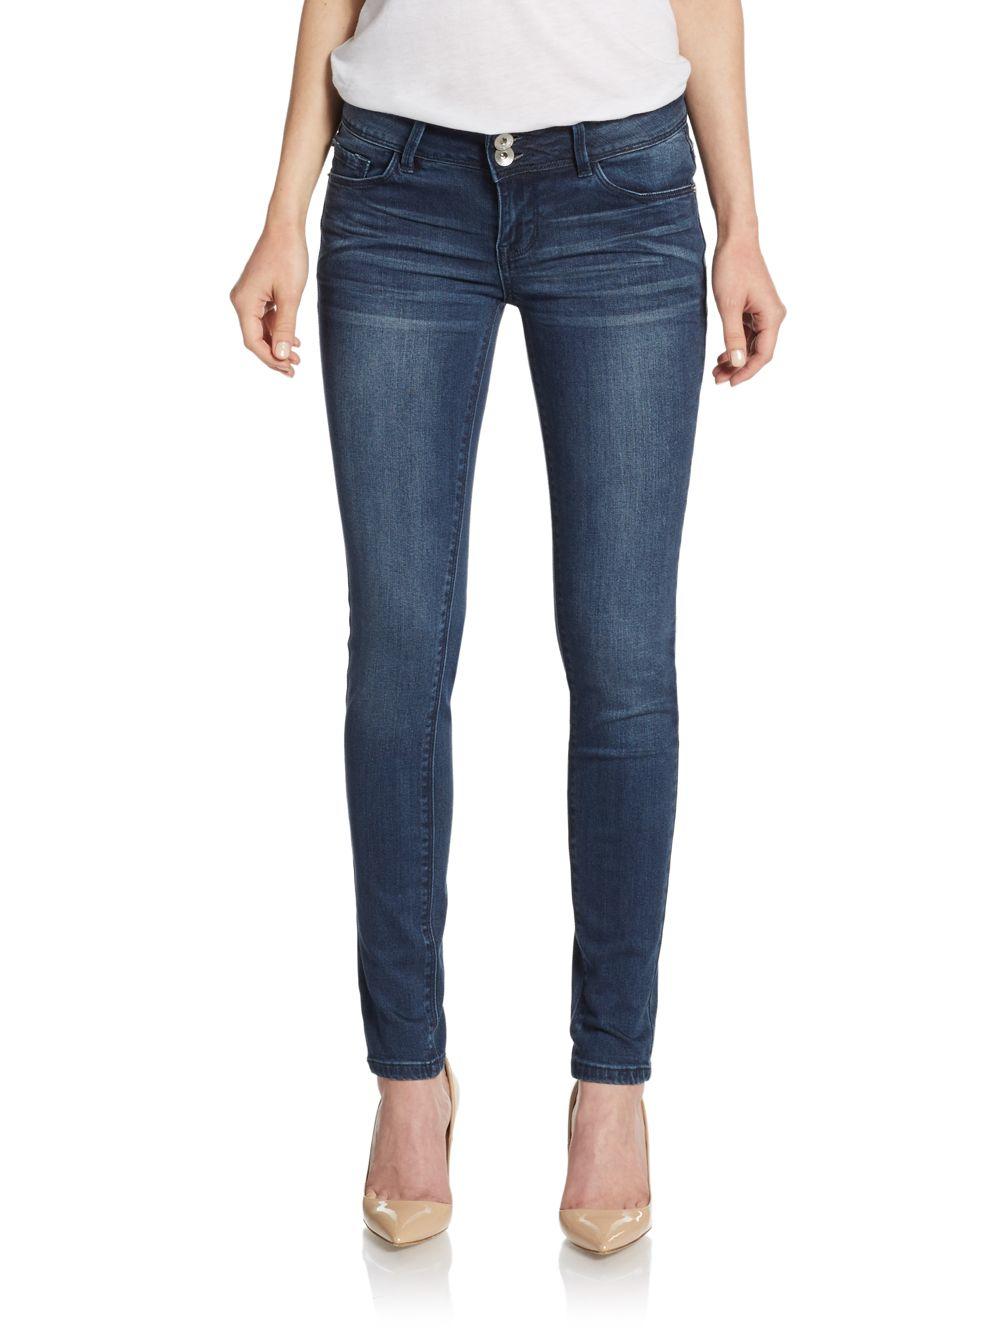 Kensie Double Button Skinny Jeans in Blue | Lyst